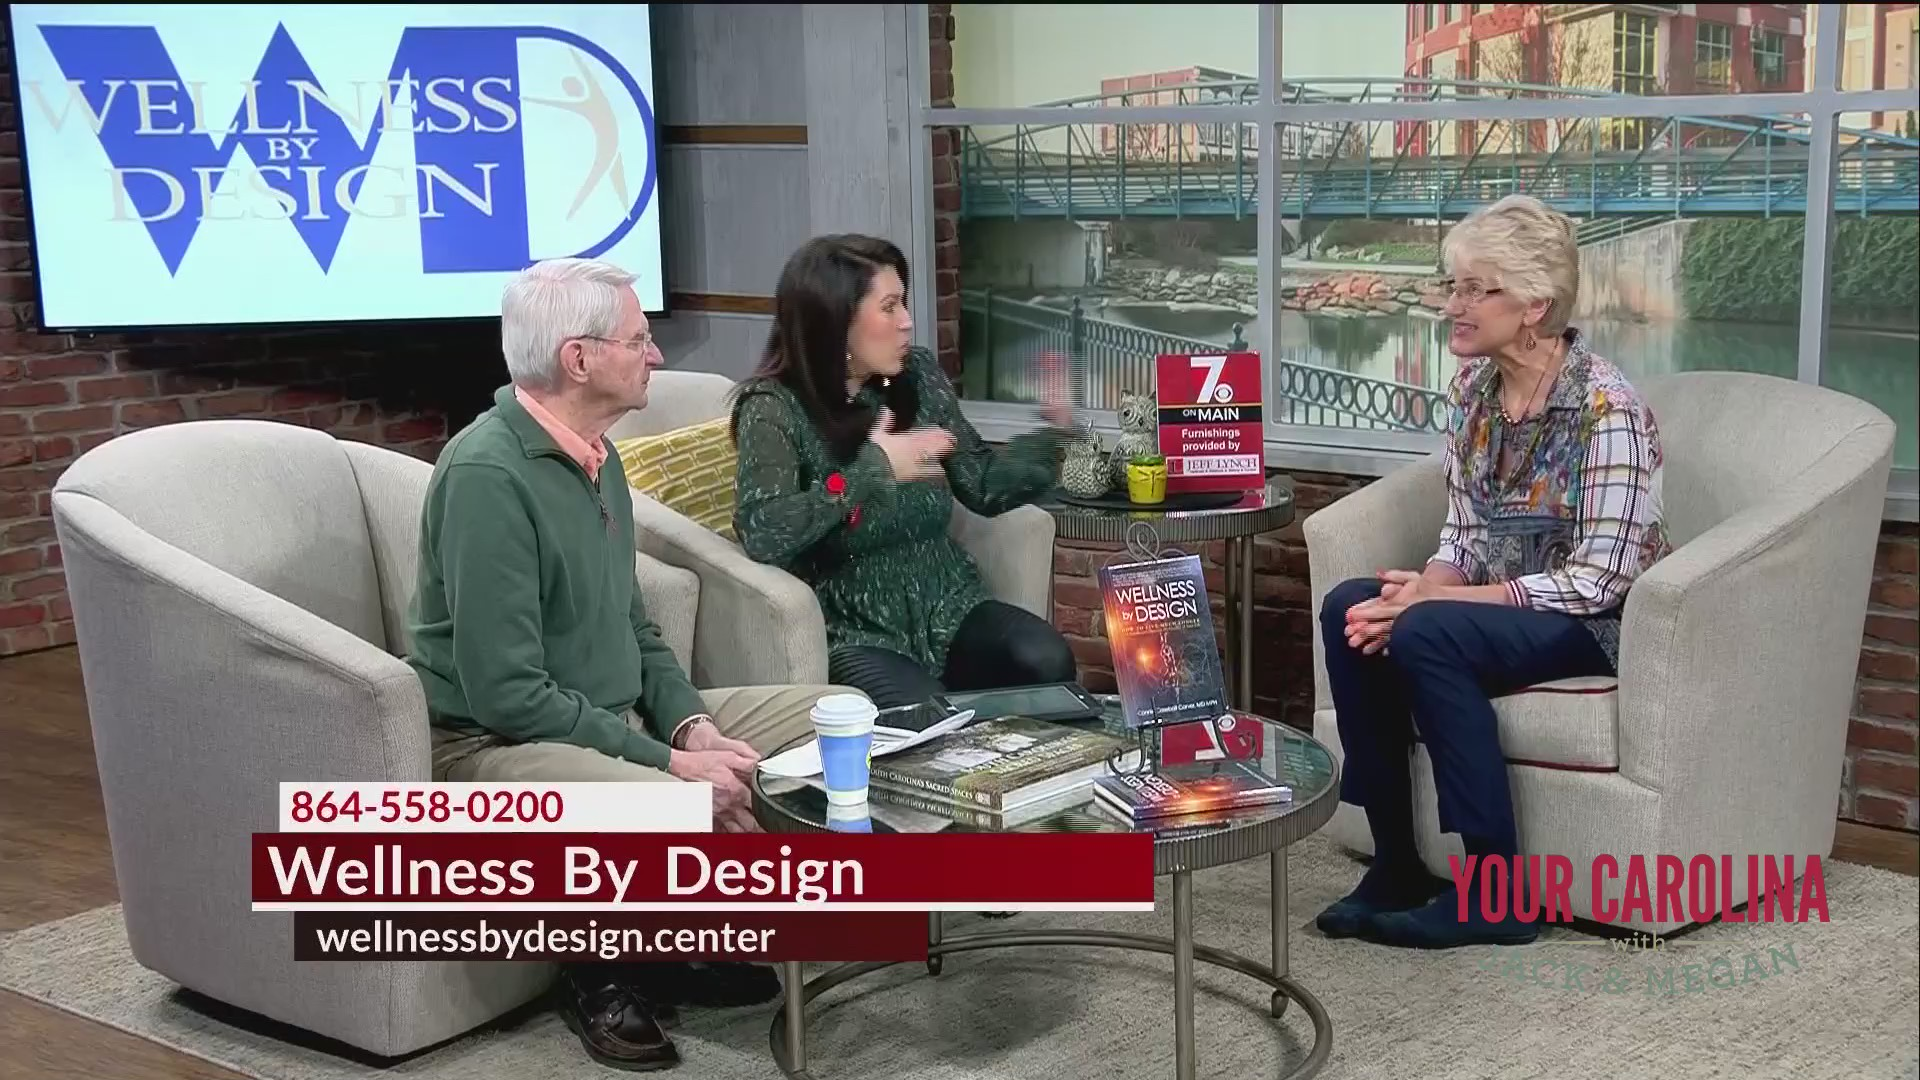 Wellness By Design - Novel Uses for Stem Cells